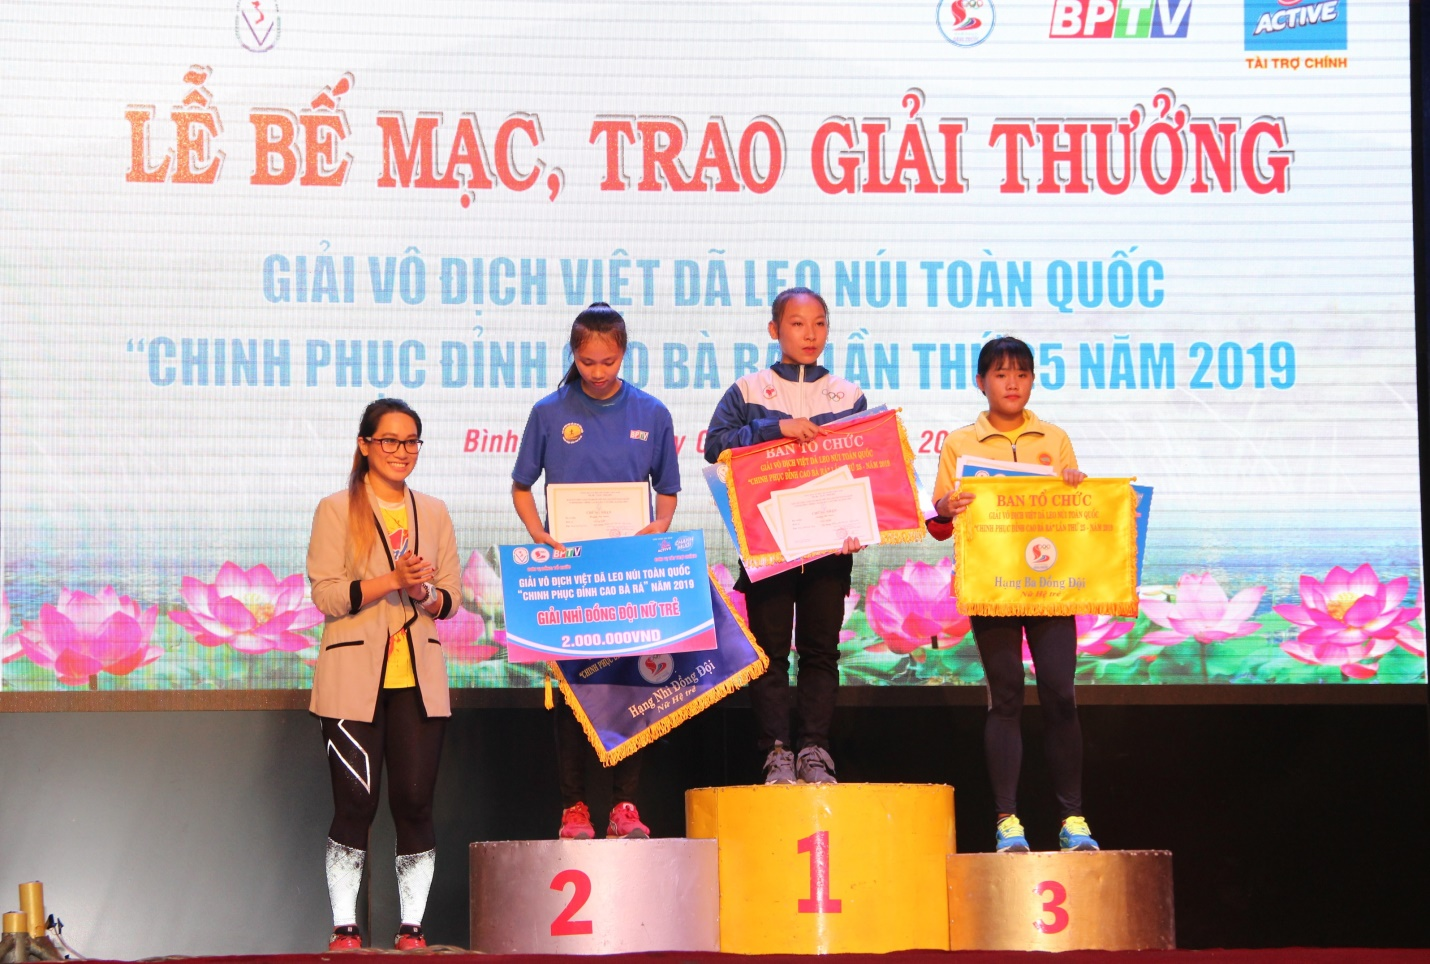 Description: E:\3. PR Doi ngoai\1. Bai PR\Viet da Binh Phuoc\Hinh 2.jpg